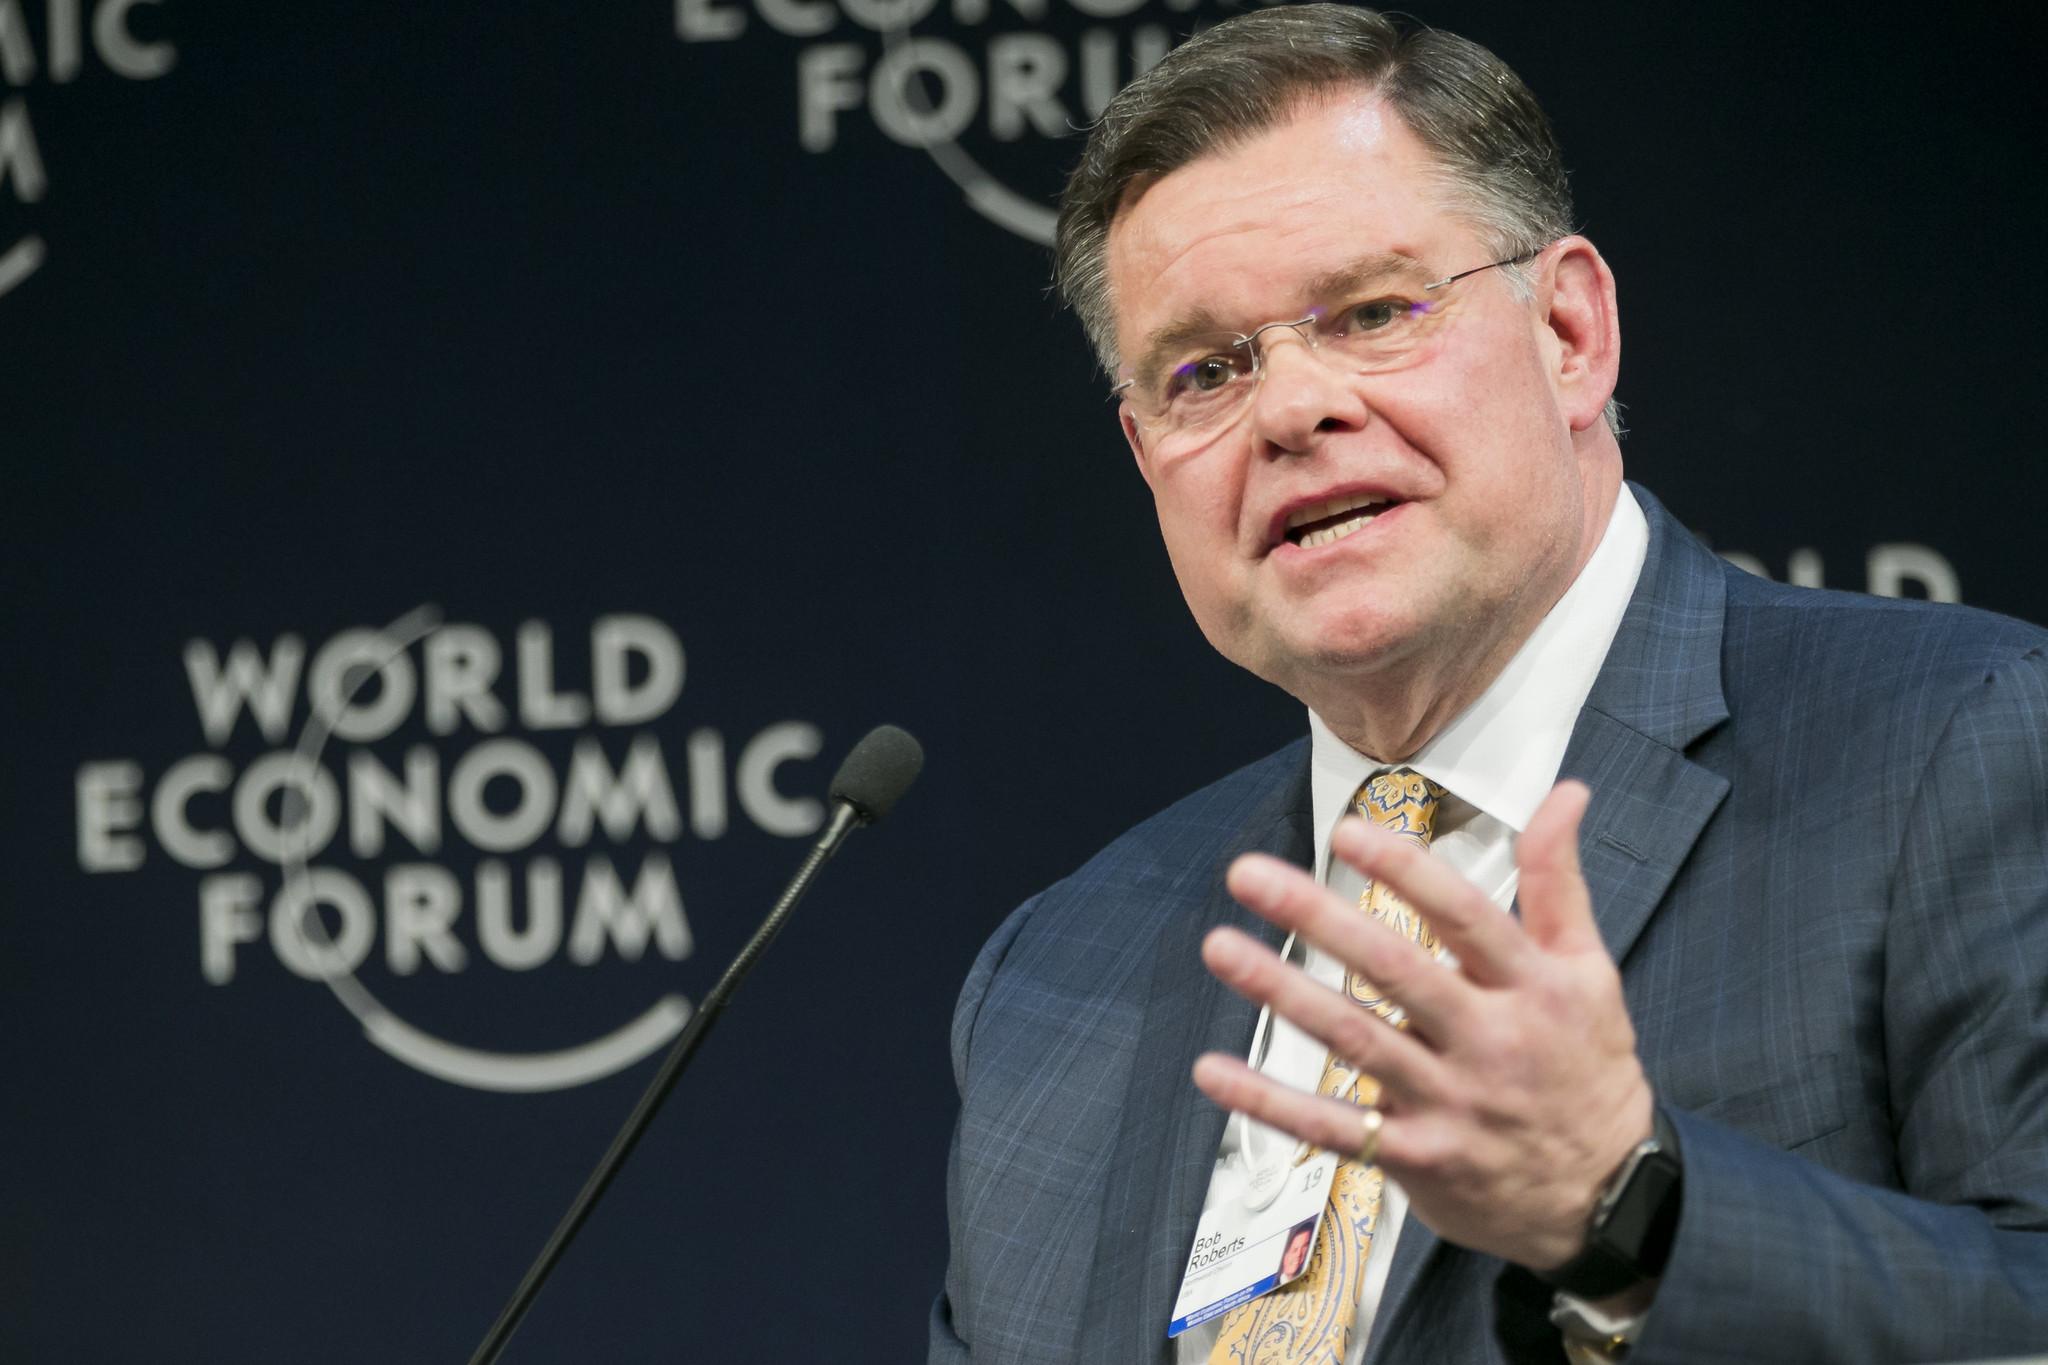 Bob Roberts Jr Speaking at the World Economic Forum